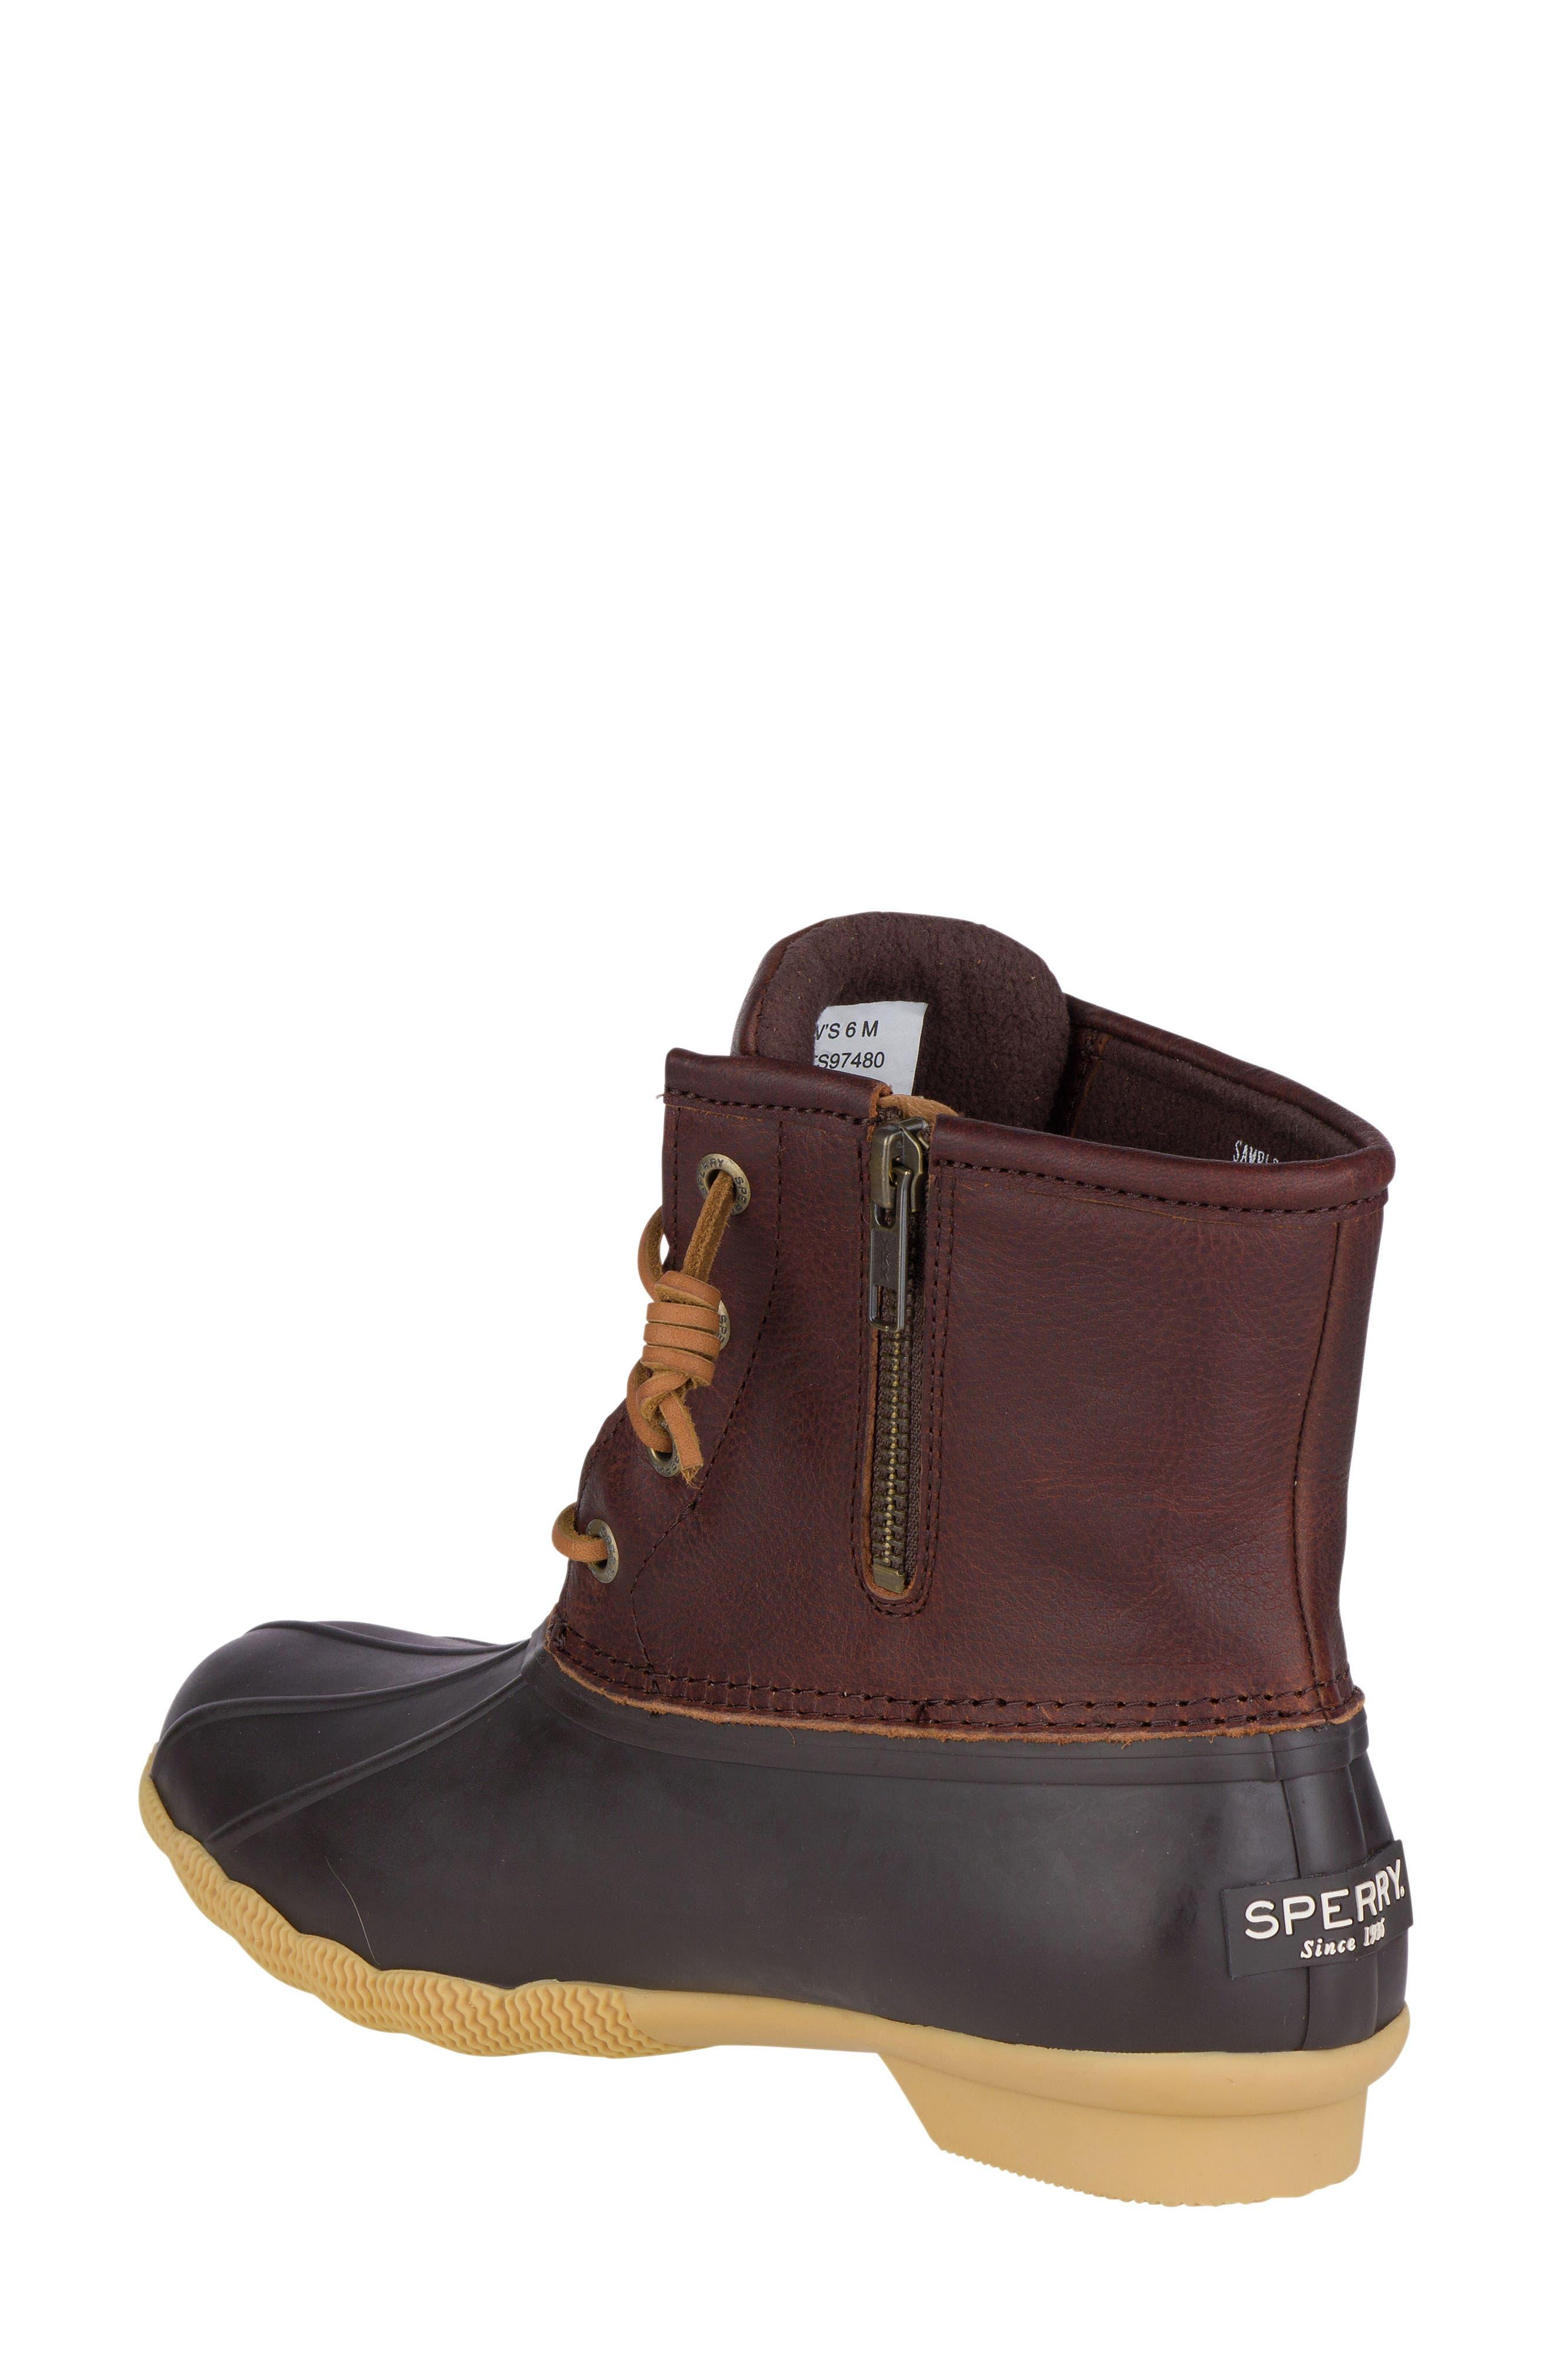 Saltwater Thinsulate<sup>™</sup> Waterproof Rain Boot,                             Alternate thumbnail 2, color,                             Tan/ Brown